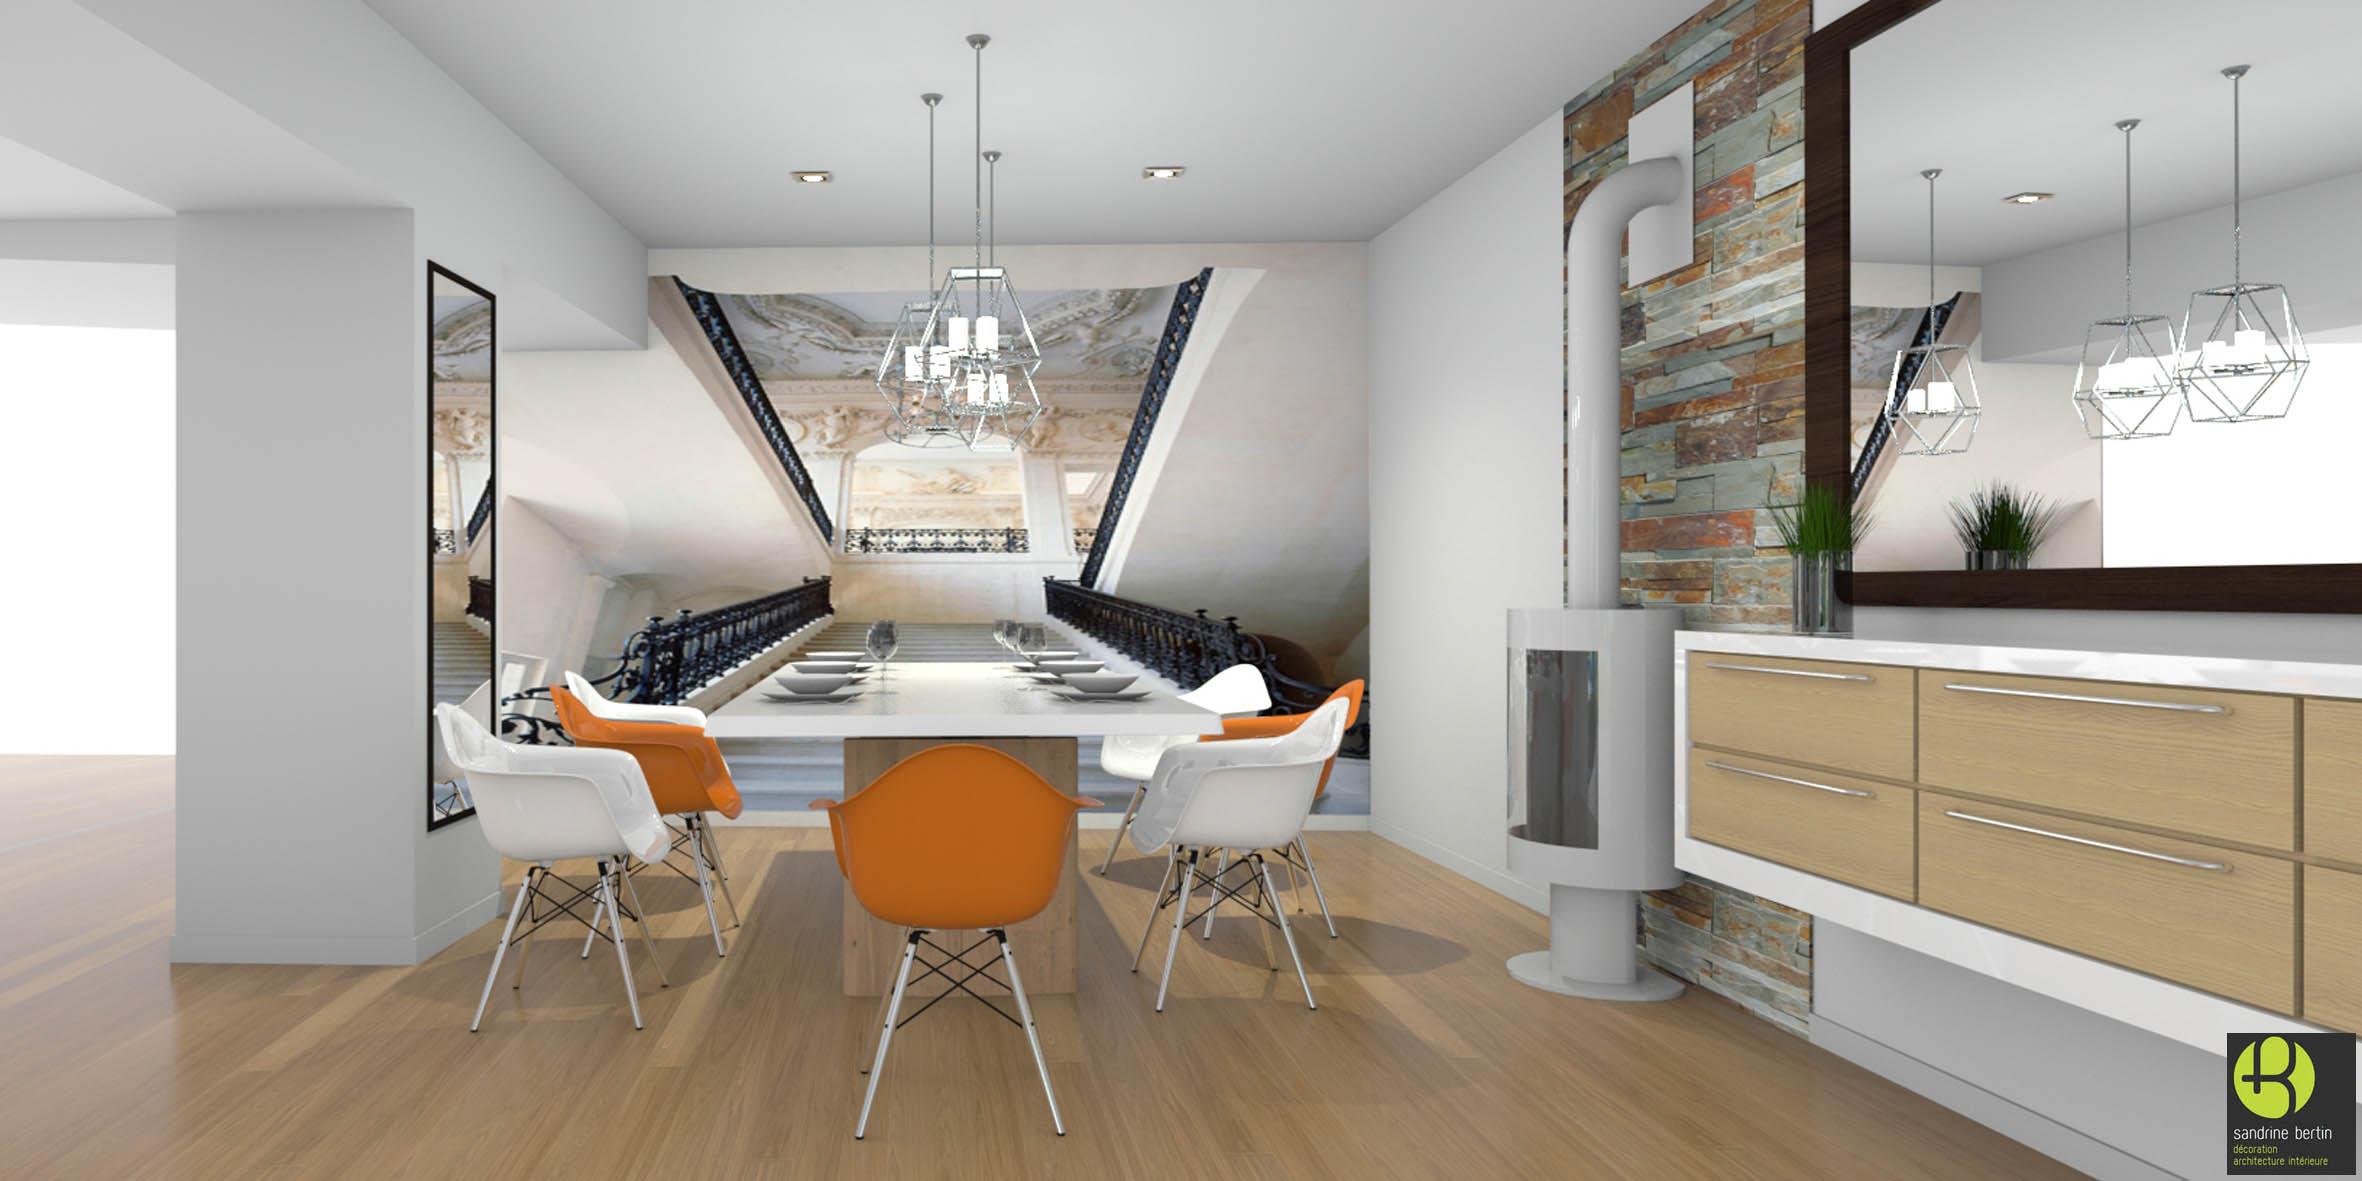 salon classique chic sandrine bertin. Black Bedroom Furniture Sets. Home Design Ideas